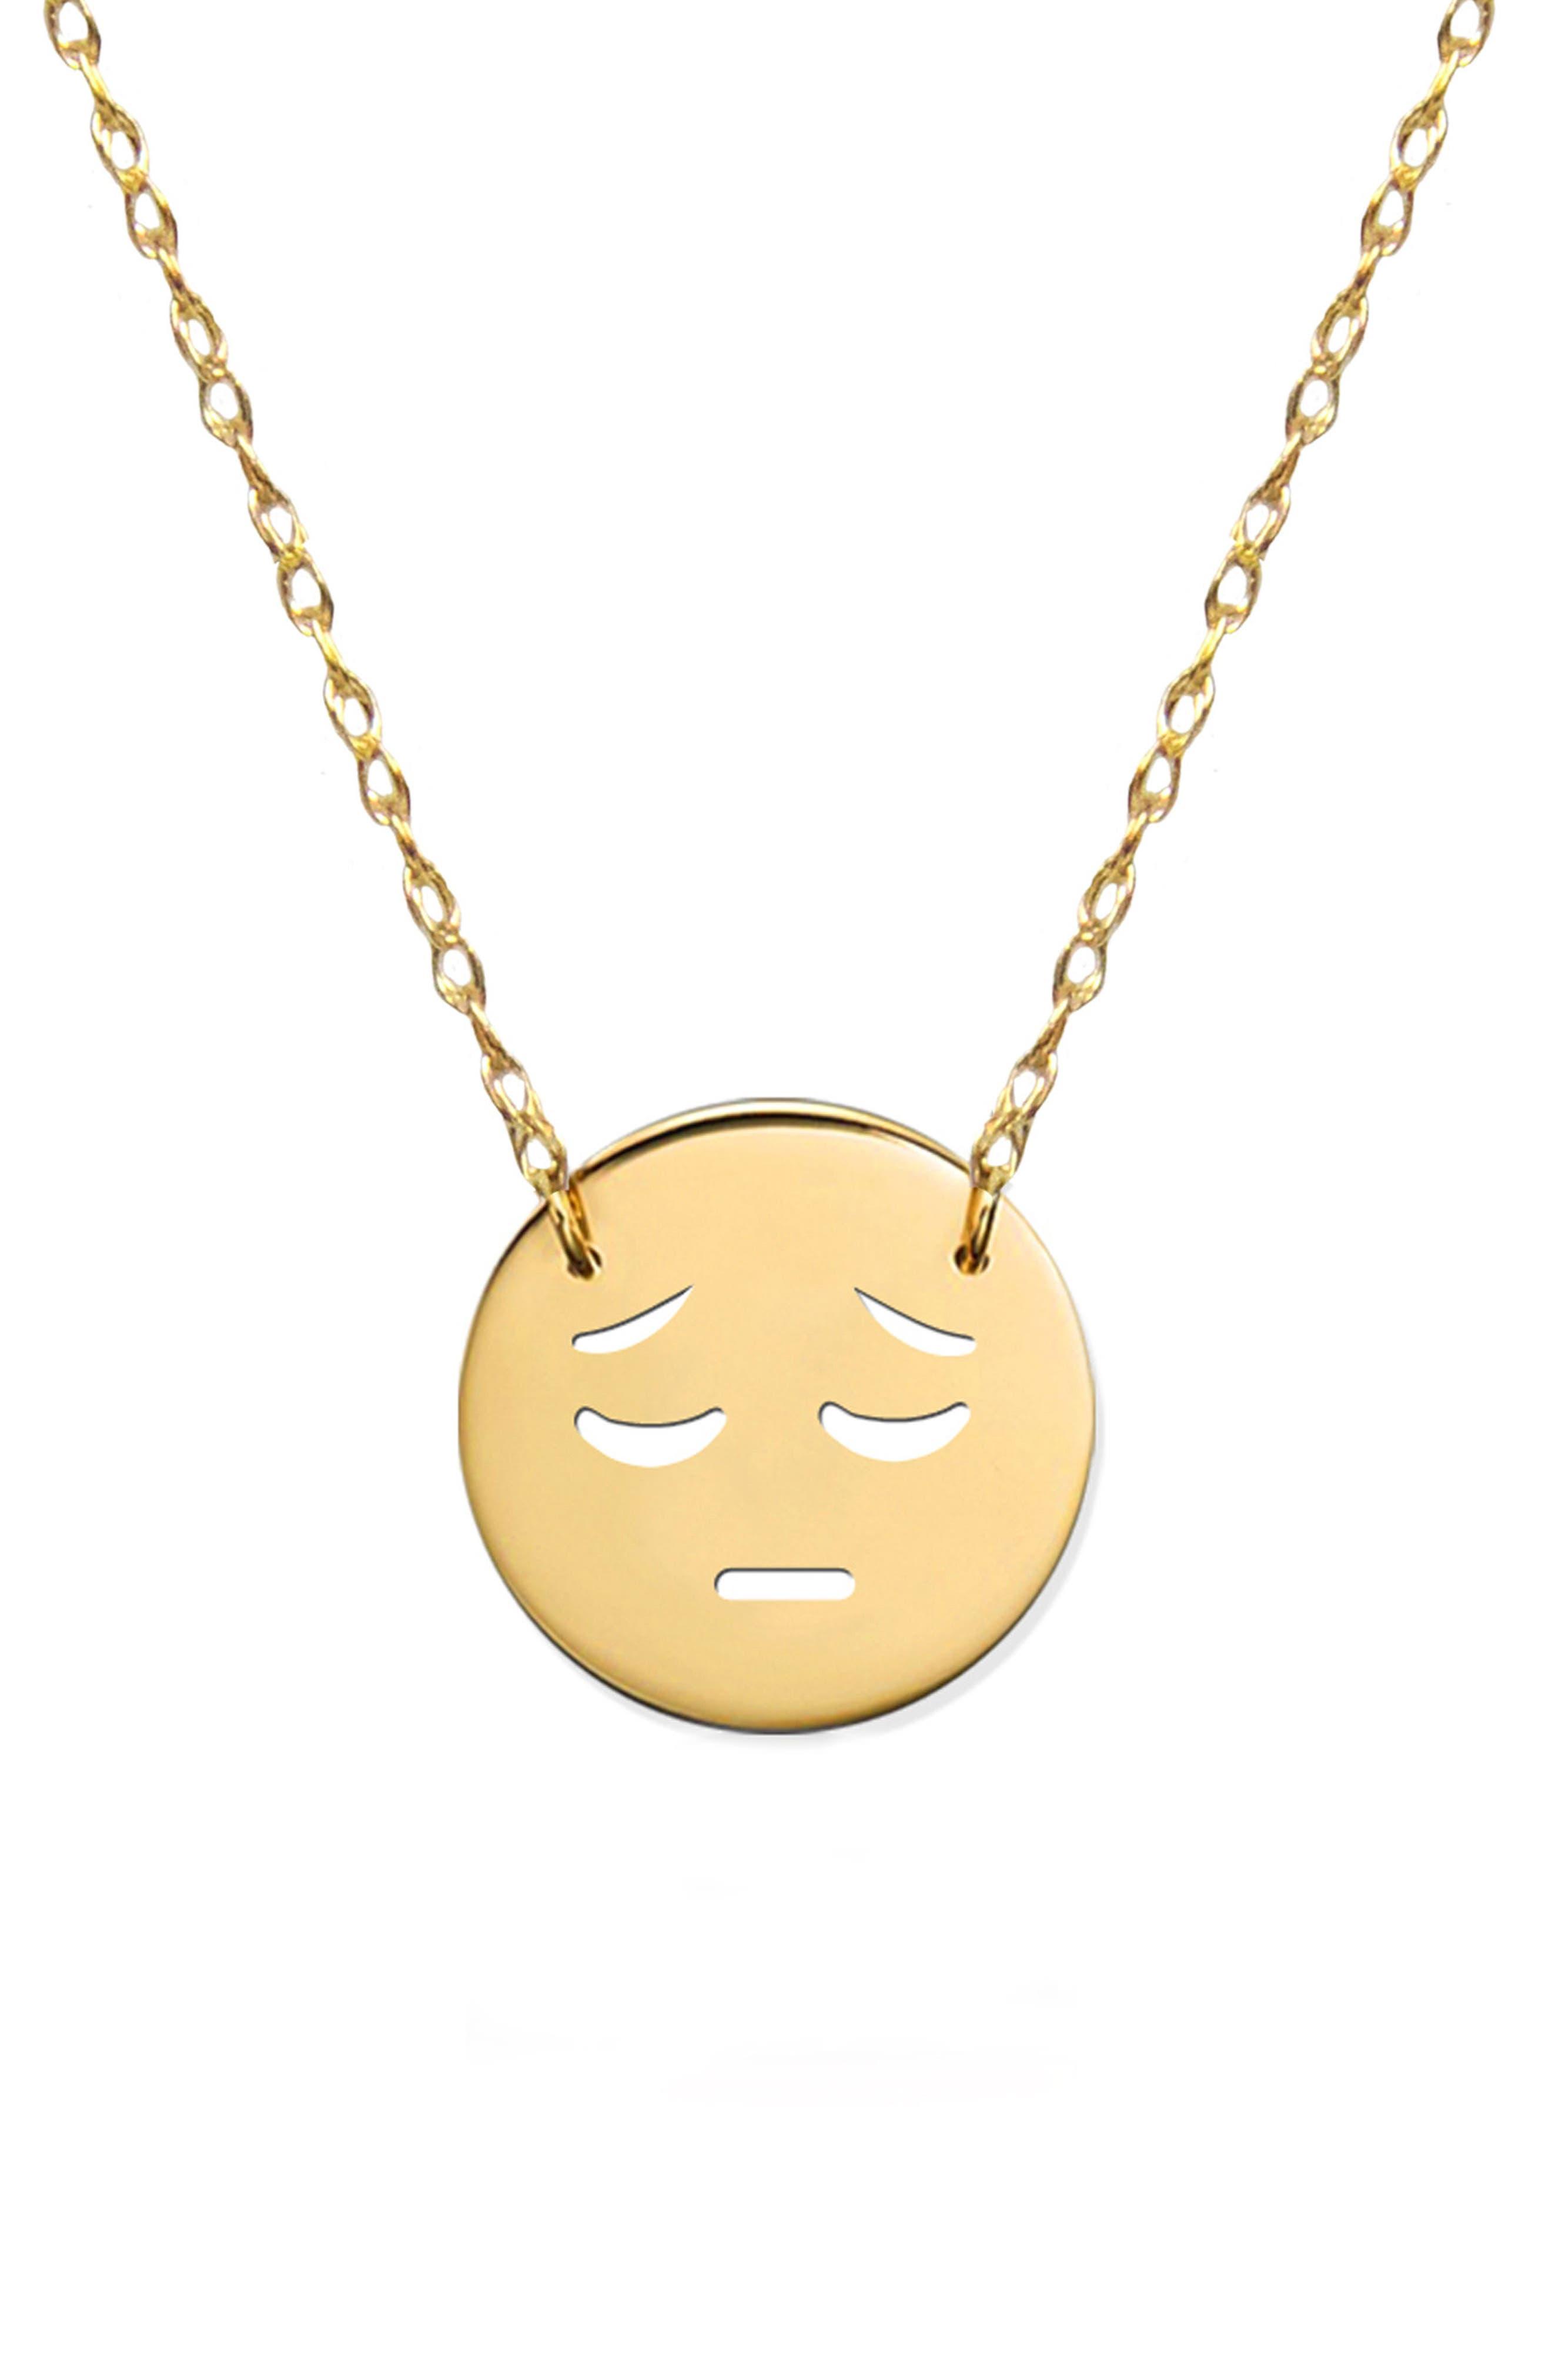 JANE BASCH DESIGNS Sad Emoji Pendant Necklace